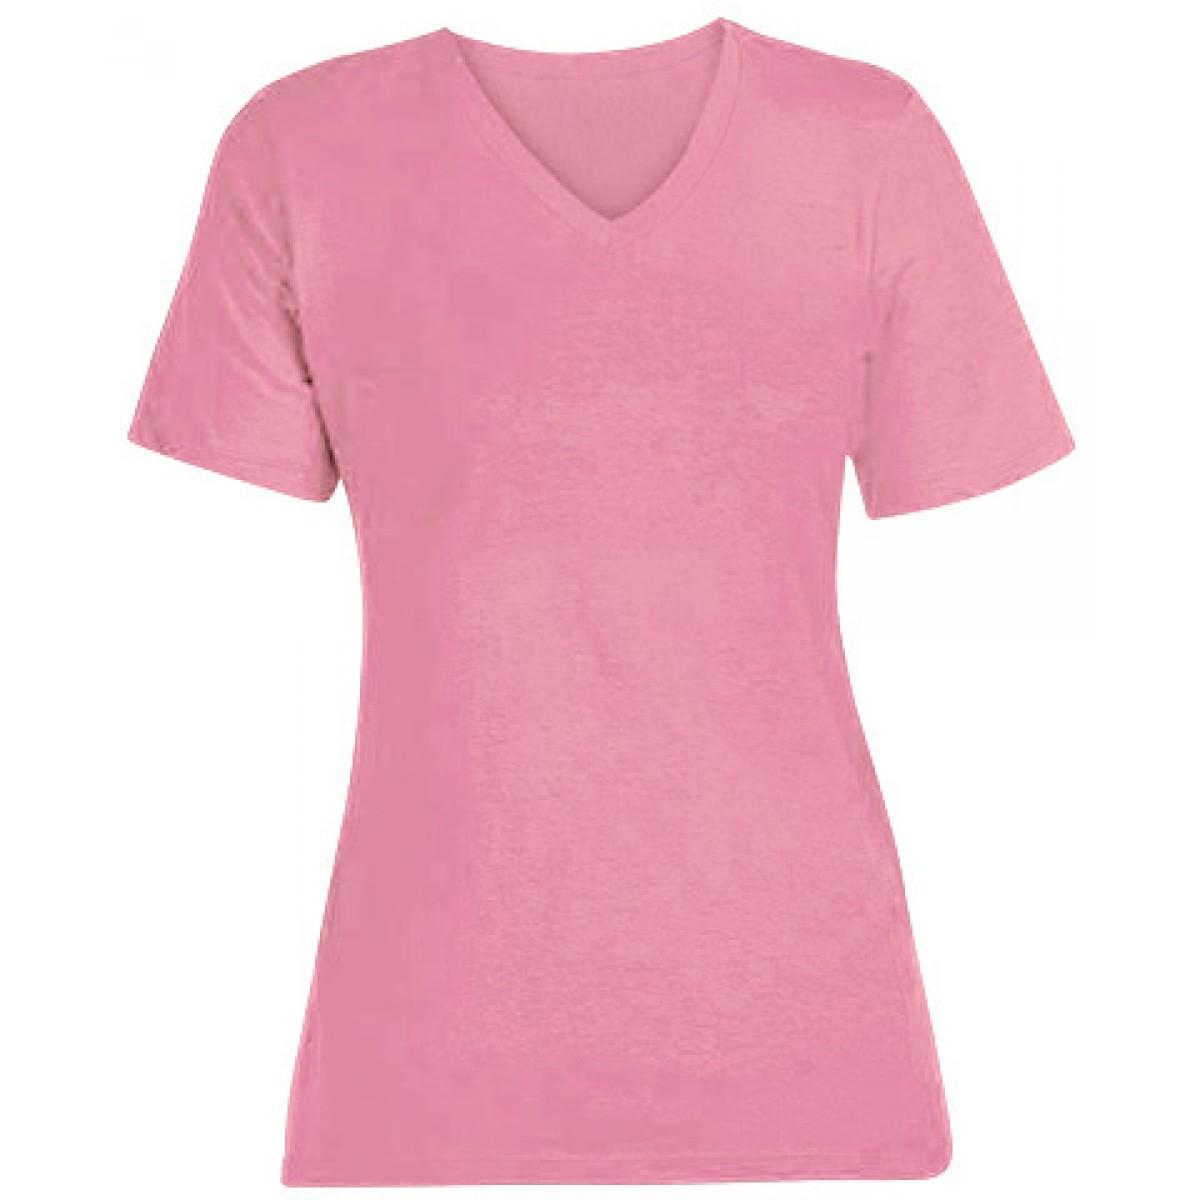 Econscious Ladies Short-Sleeve V-Neck-Pink-M